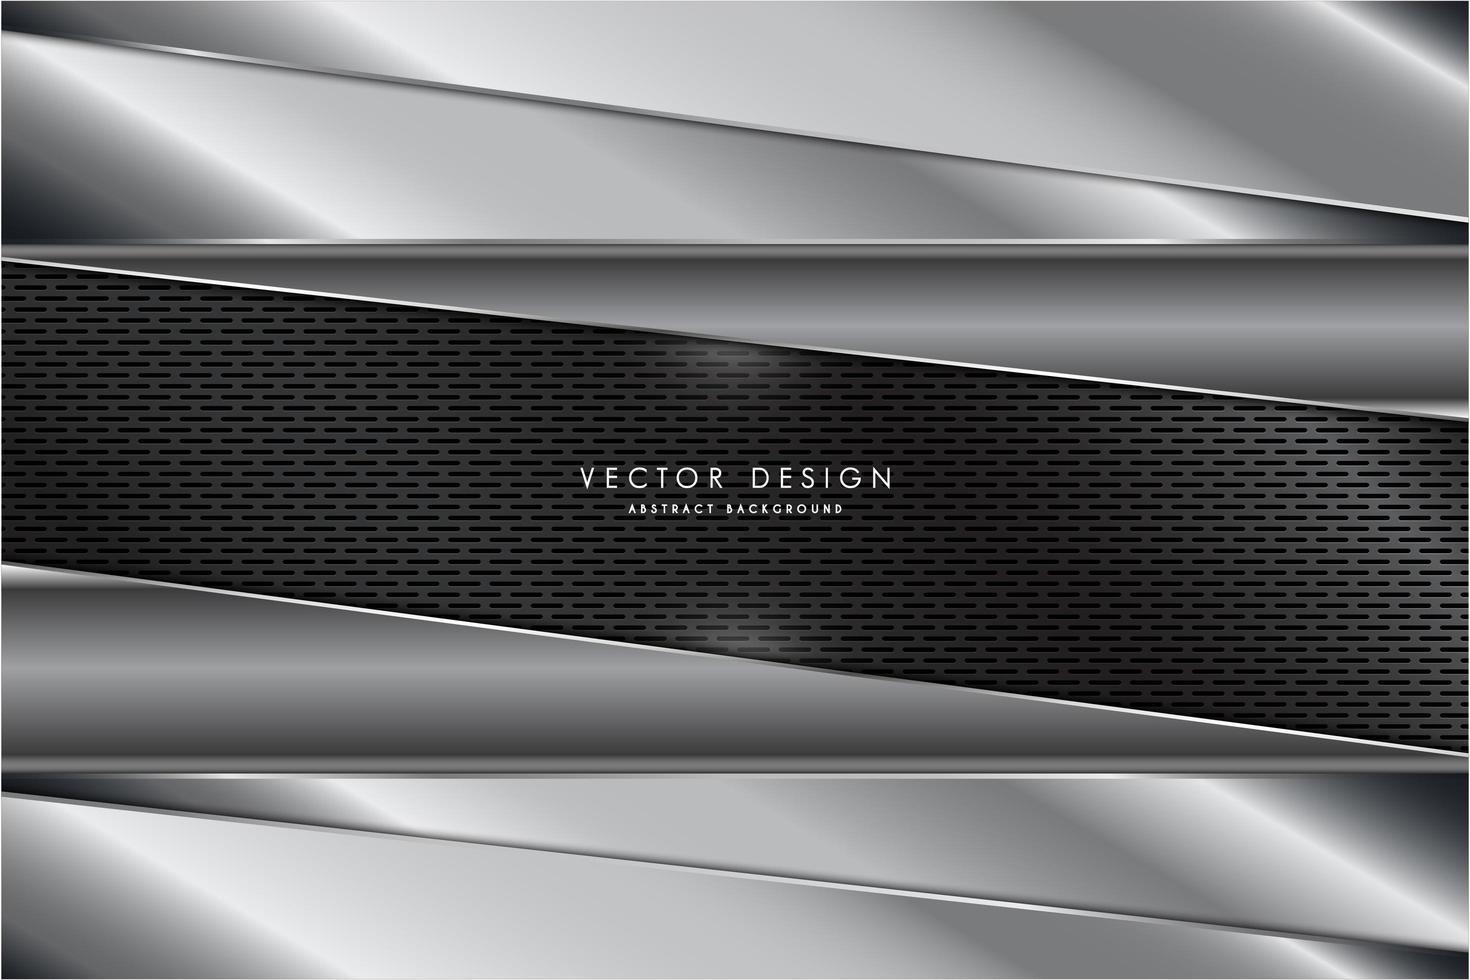 Metallic silver layered panels over gray carbon fiber texture vector